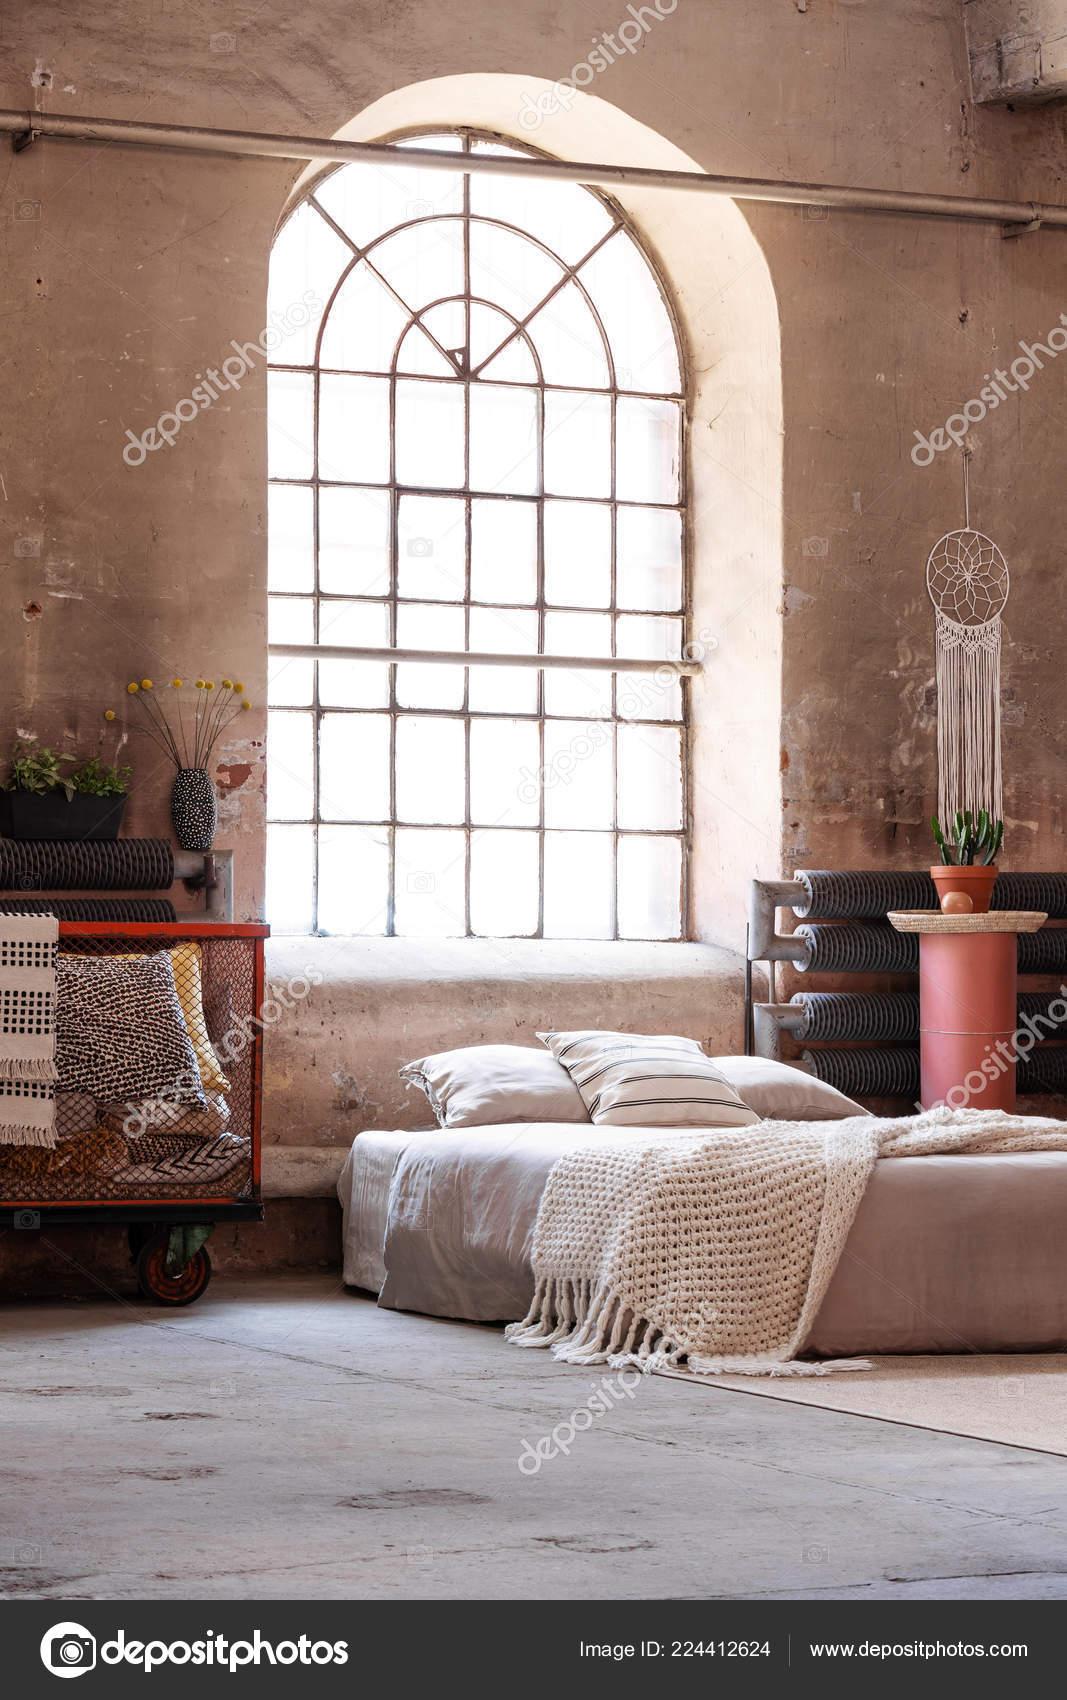 blanket bed pillows basket bright wabi sabi bedroom interior window rh depositphotos com wabi sabi bedroom furniture